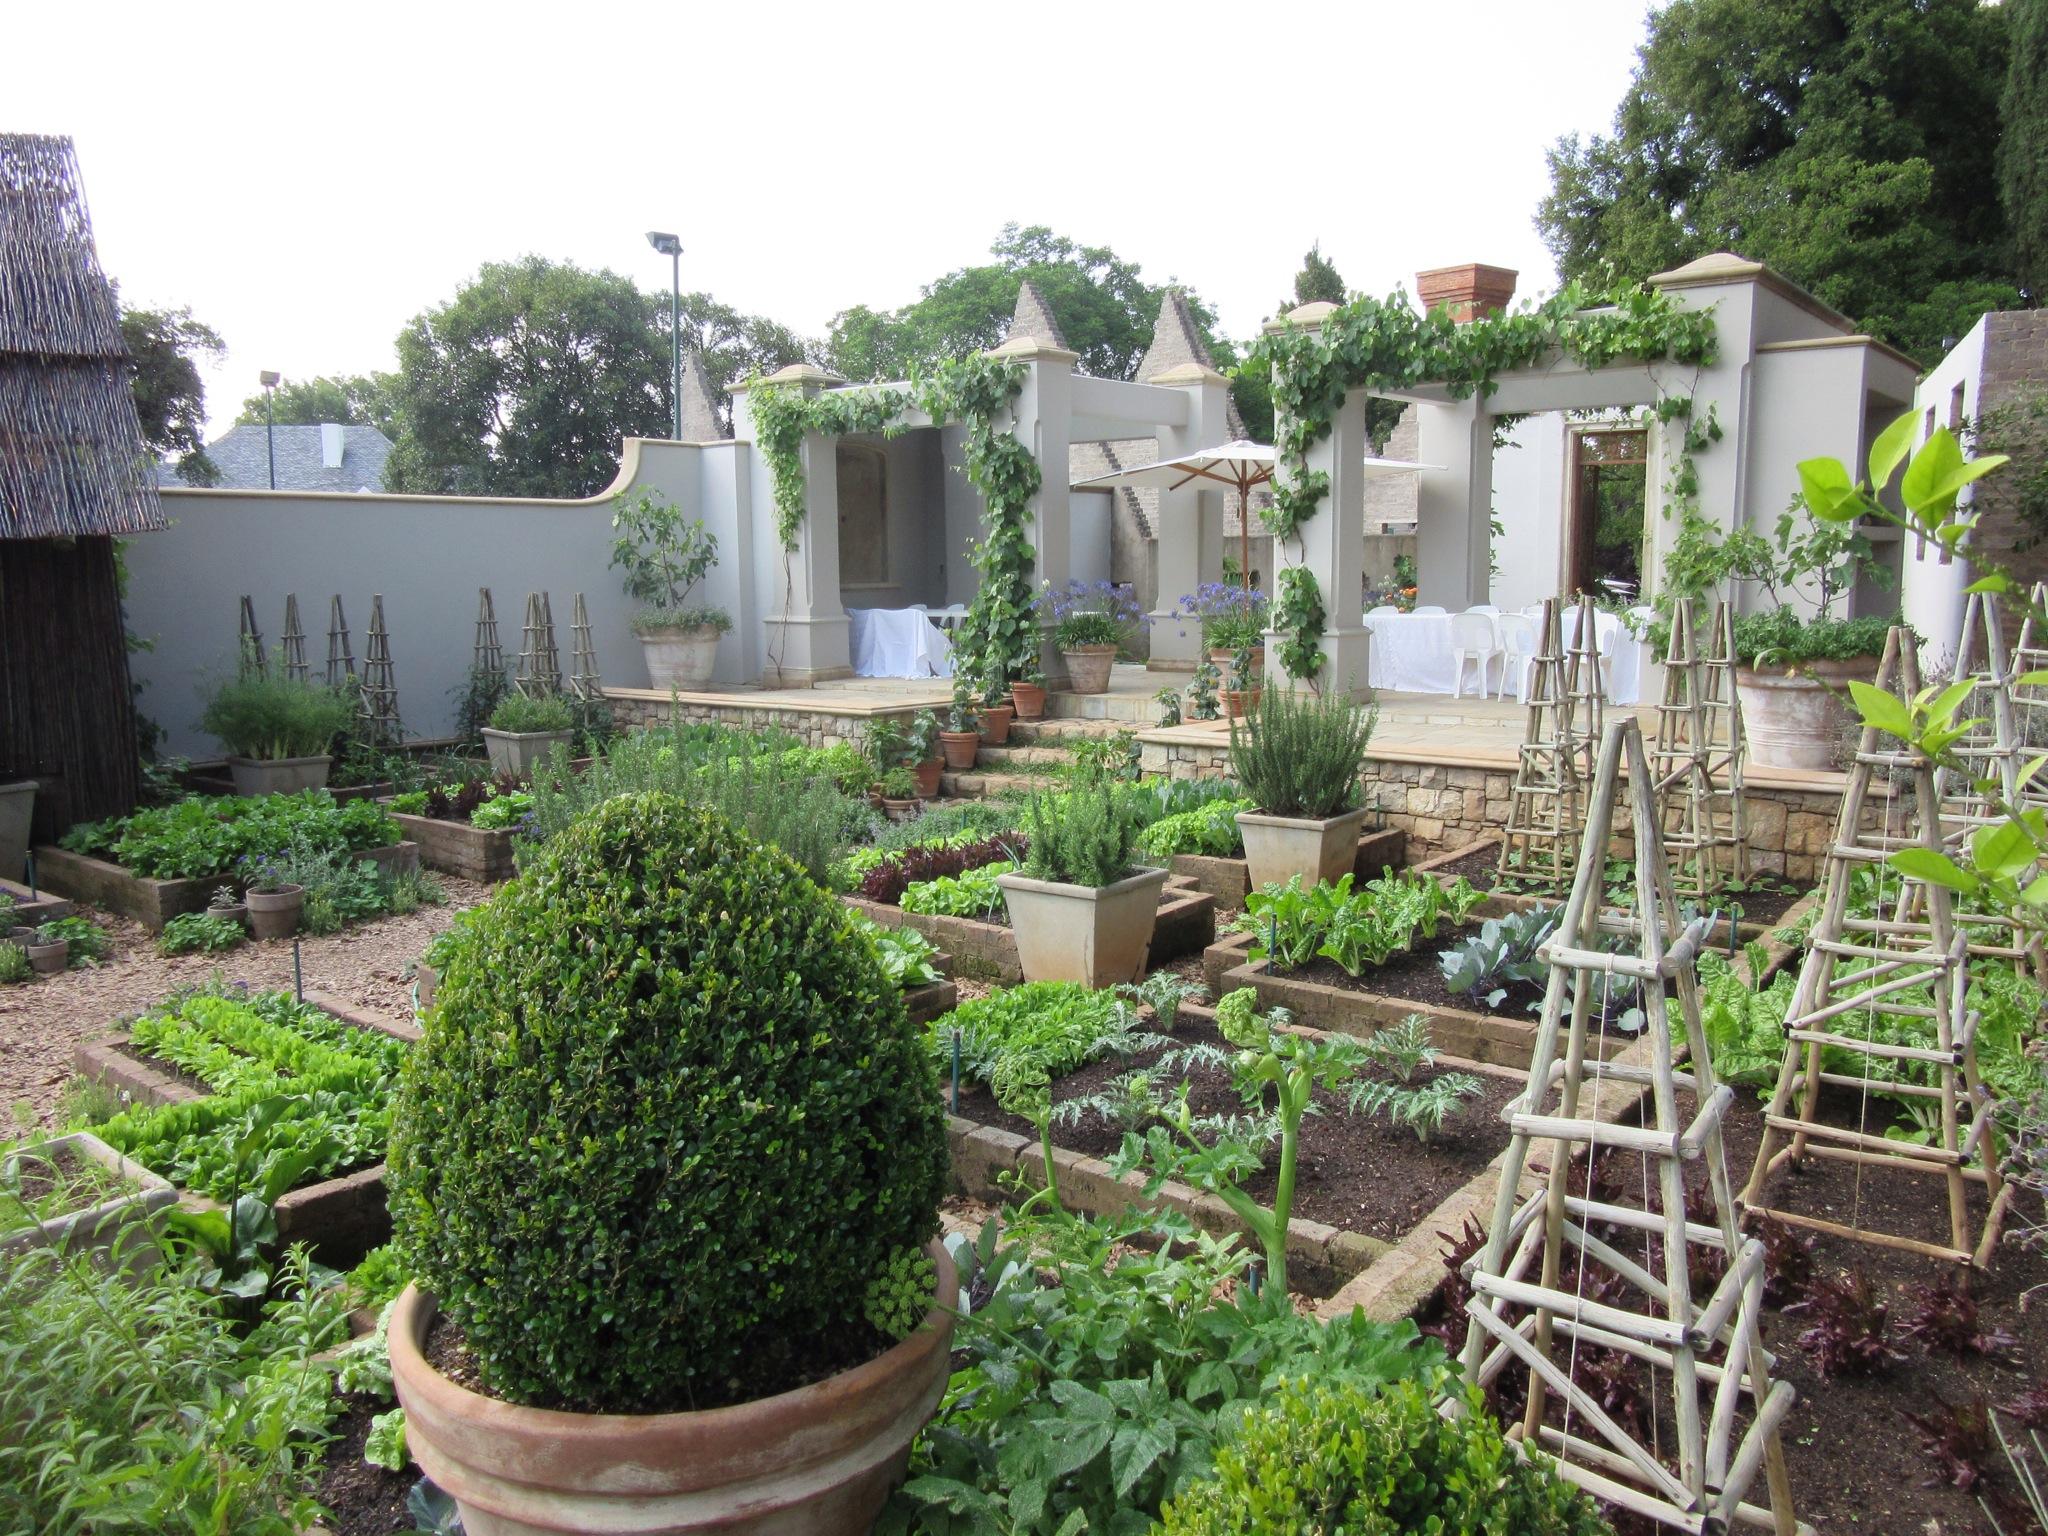 Beechwood gardens johannesburg south africa decorata for Garden design johannesburg